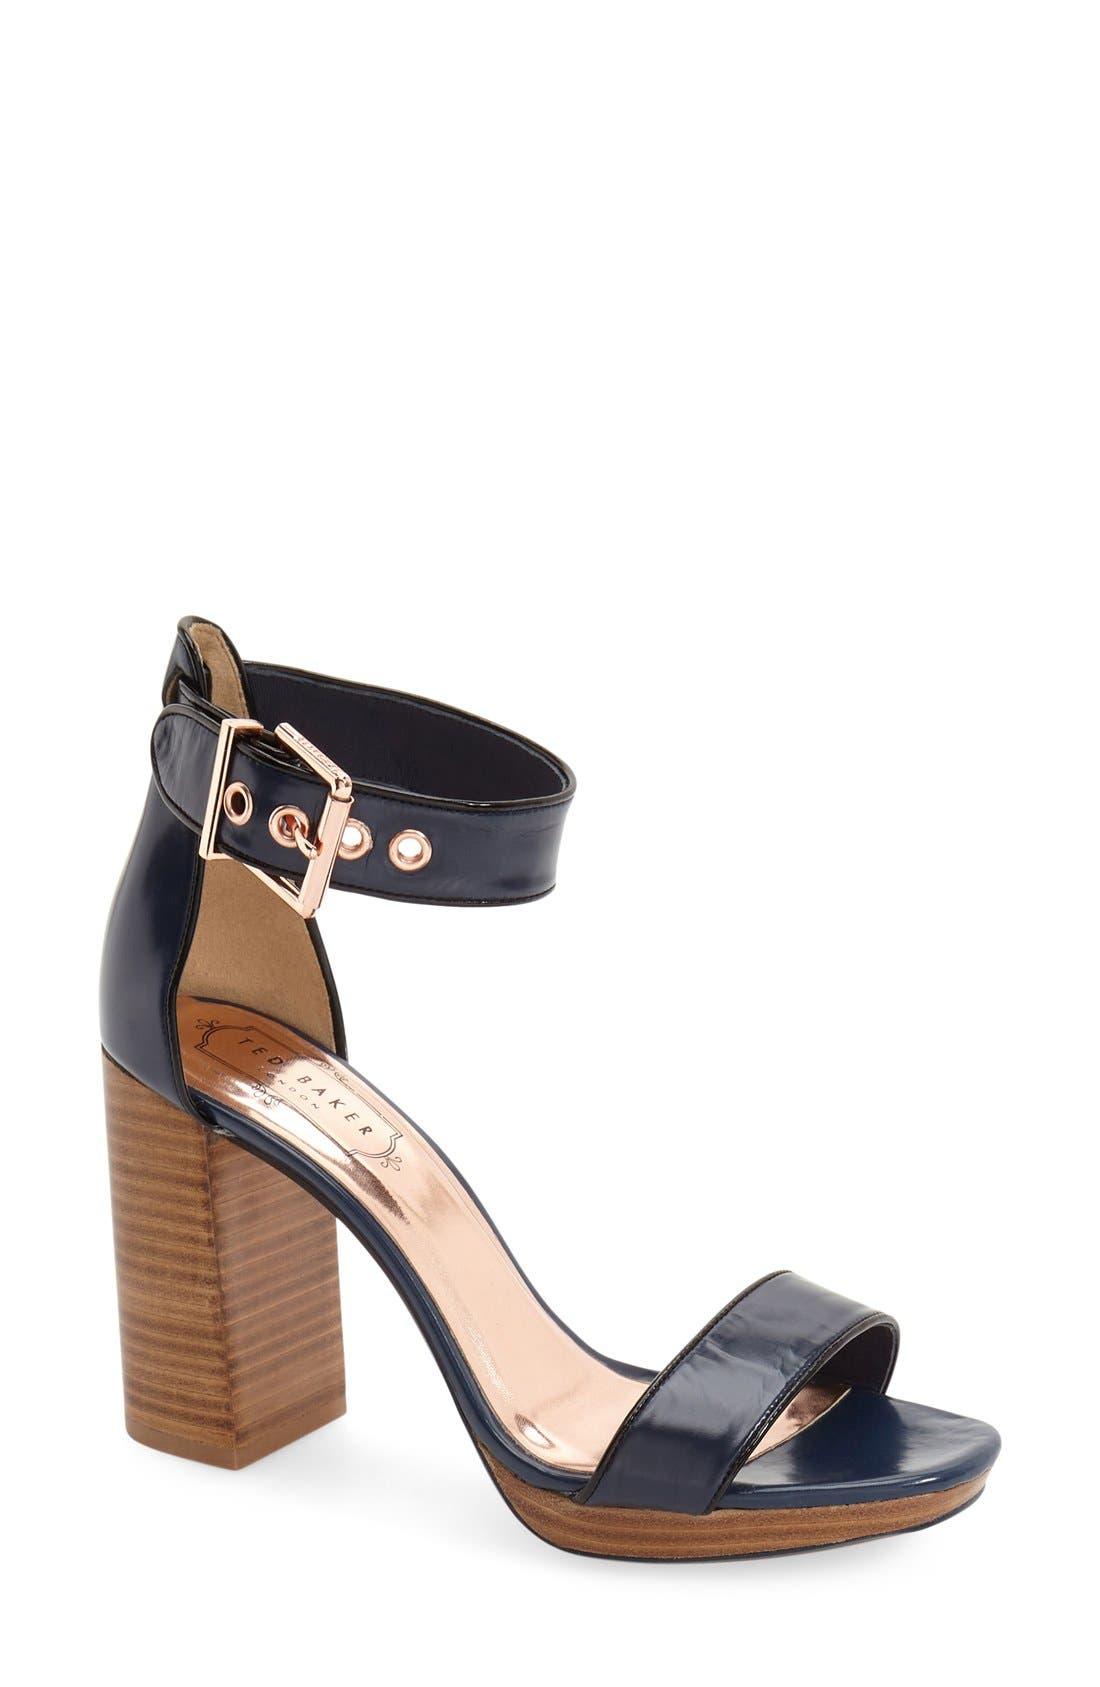 Alternate Image 1 Selected - Ted Baker London 'Lorno' Sandal (Women)